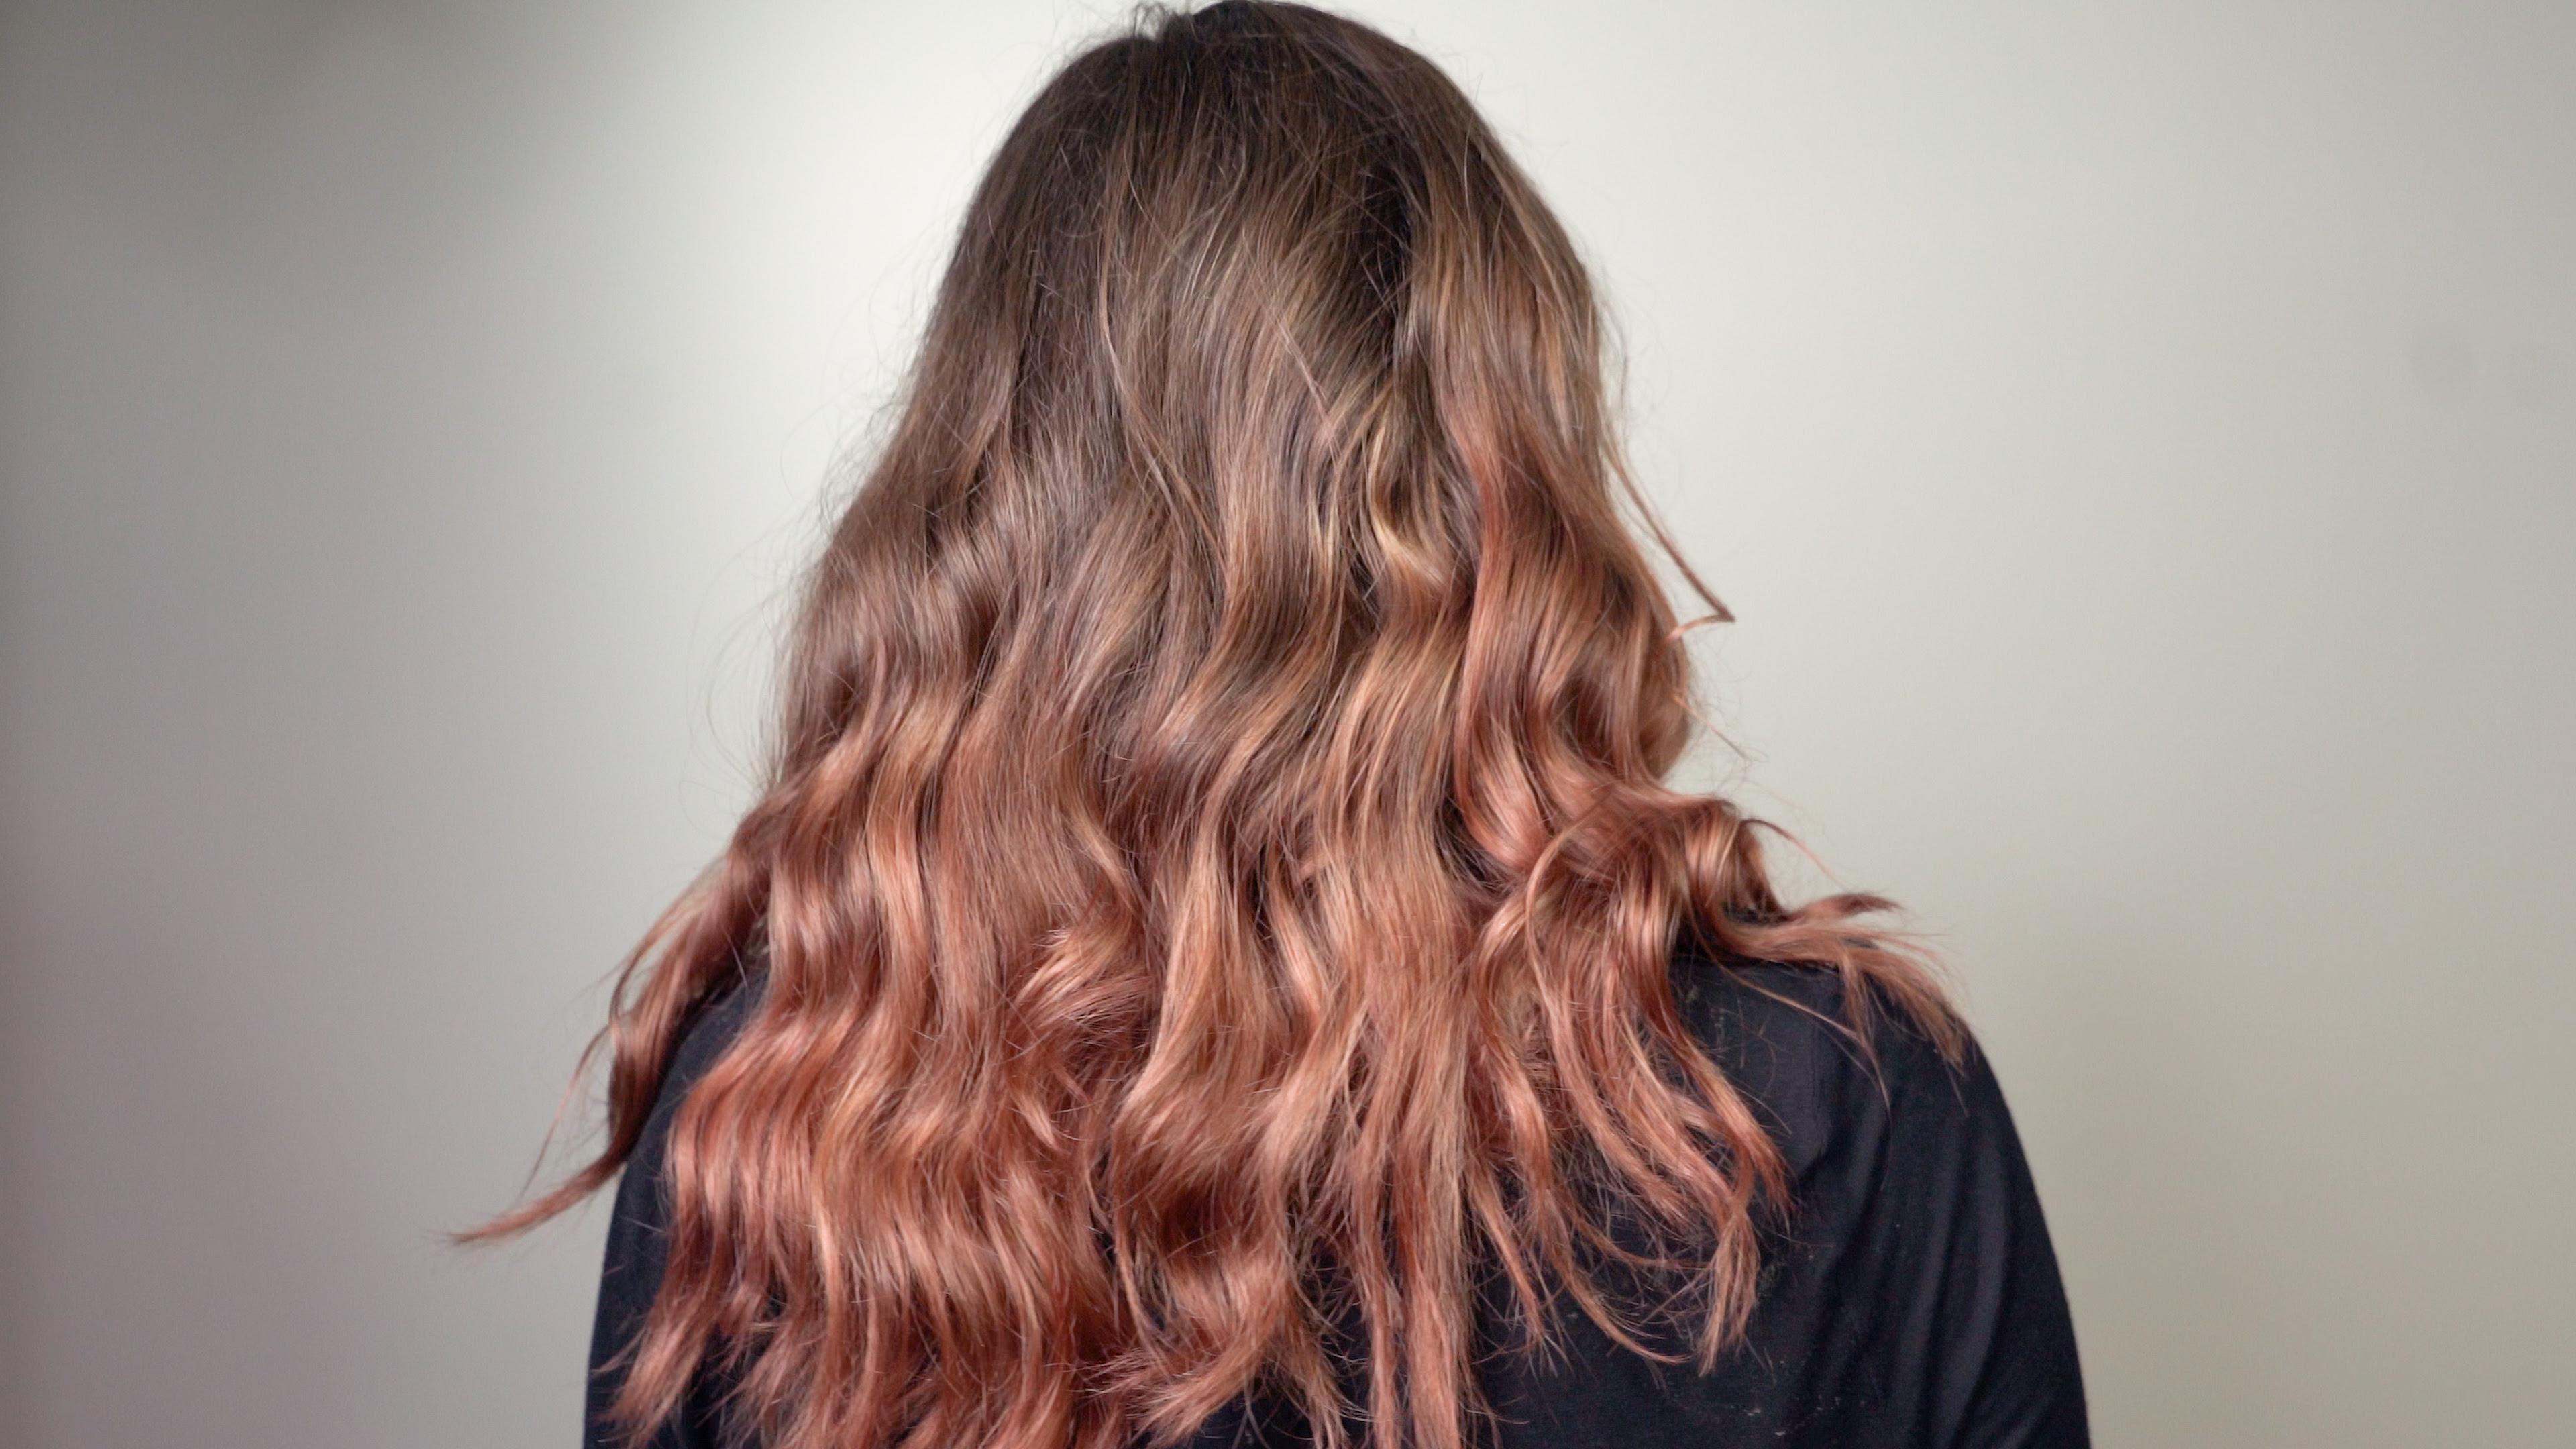 Rose Gold Deep Treatment on Dark Blonde Hair • The oVertone Haircare Blog: Must-See Fantasy Hair ...